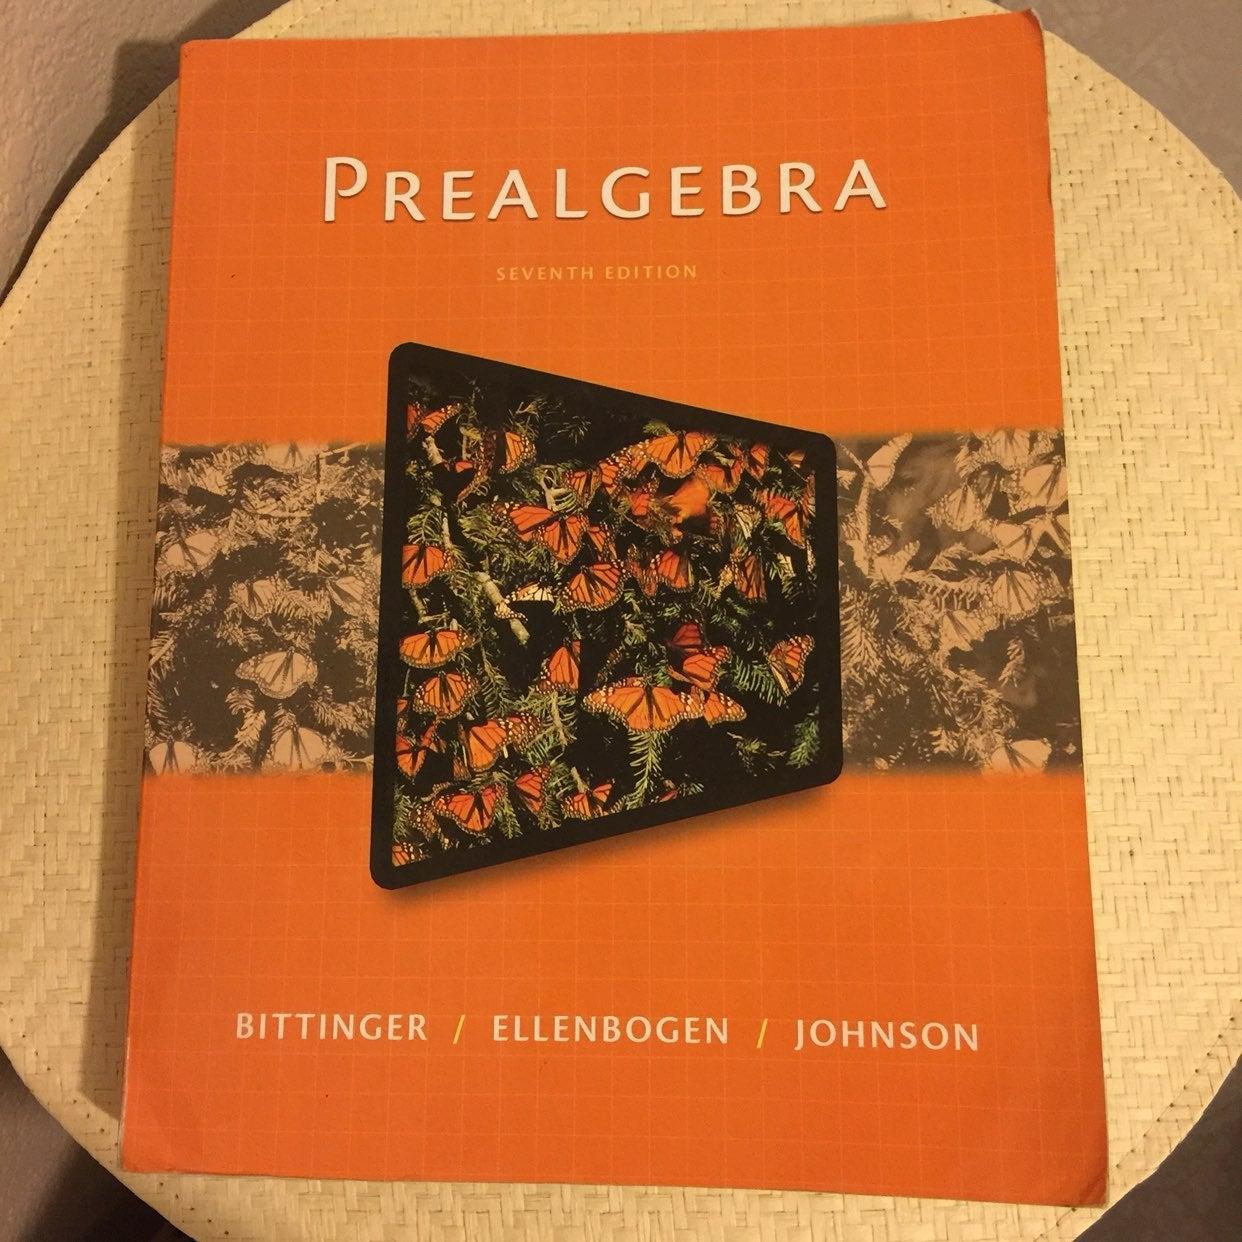 Prealgebra 7th edition Bittinger Ellenbo